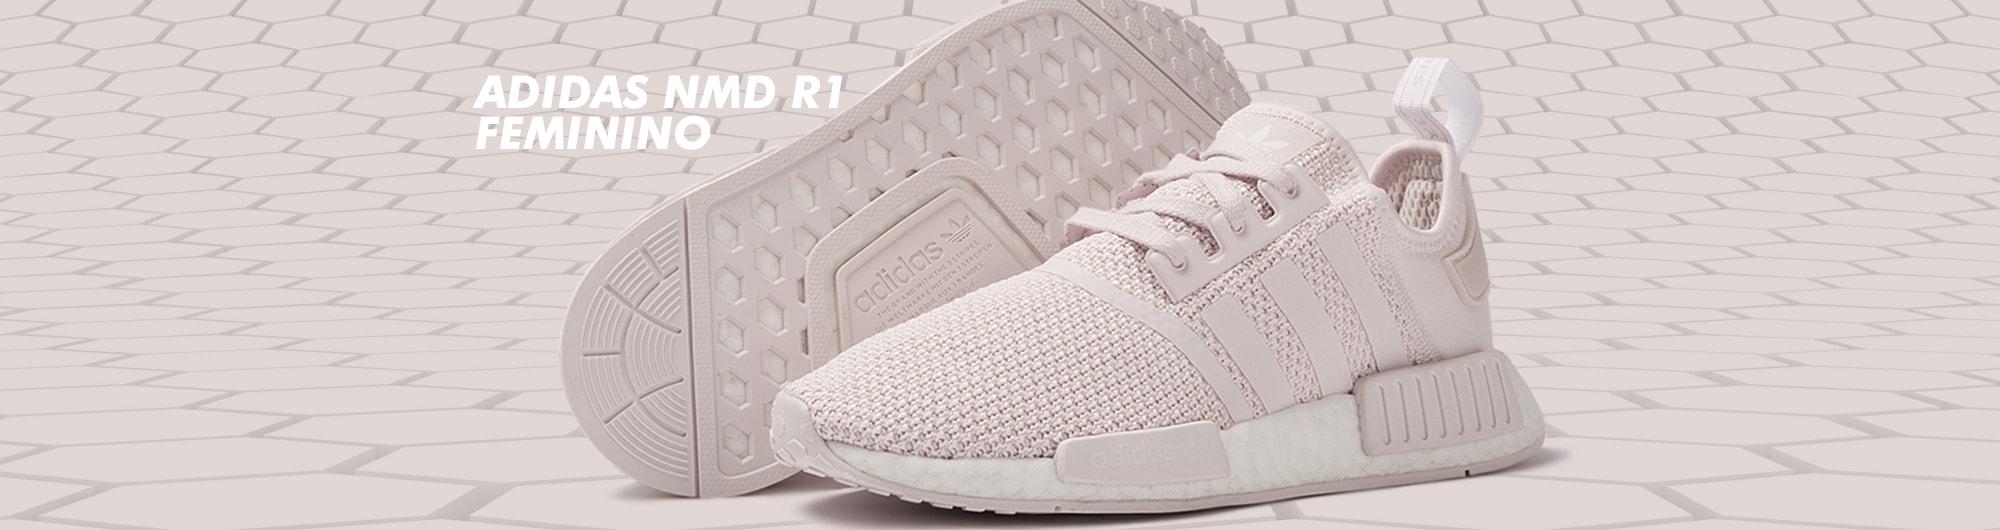 tvdesk_p2_adidas_NDM_FEM